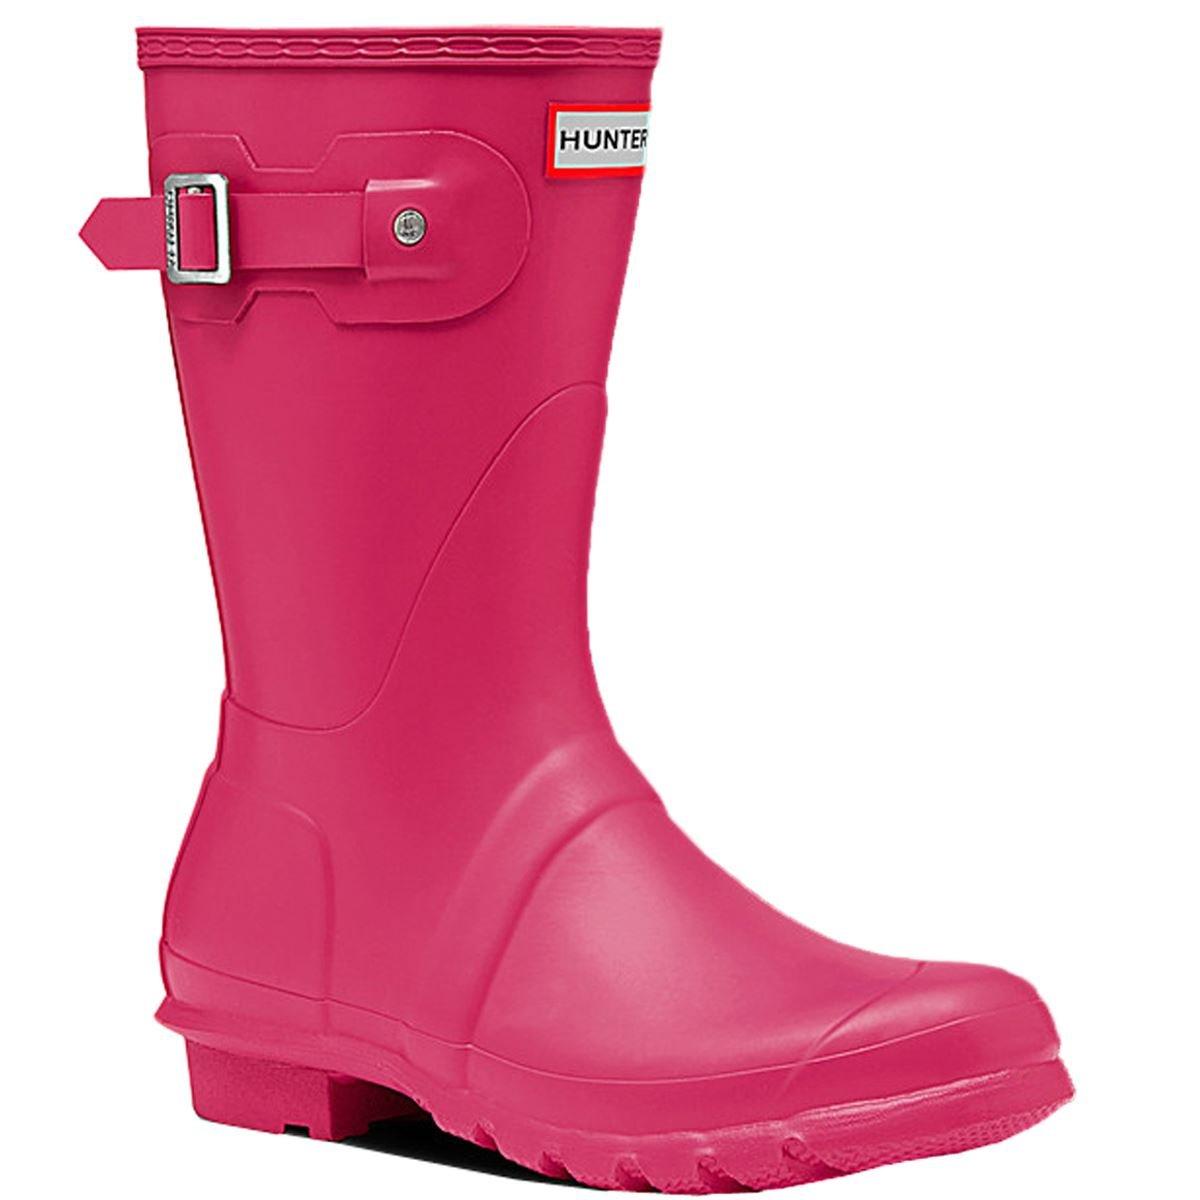 Hunter Women's Original Short Rain Boots Bright Pink 6 M US